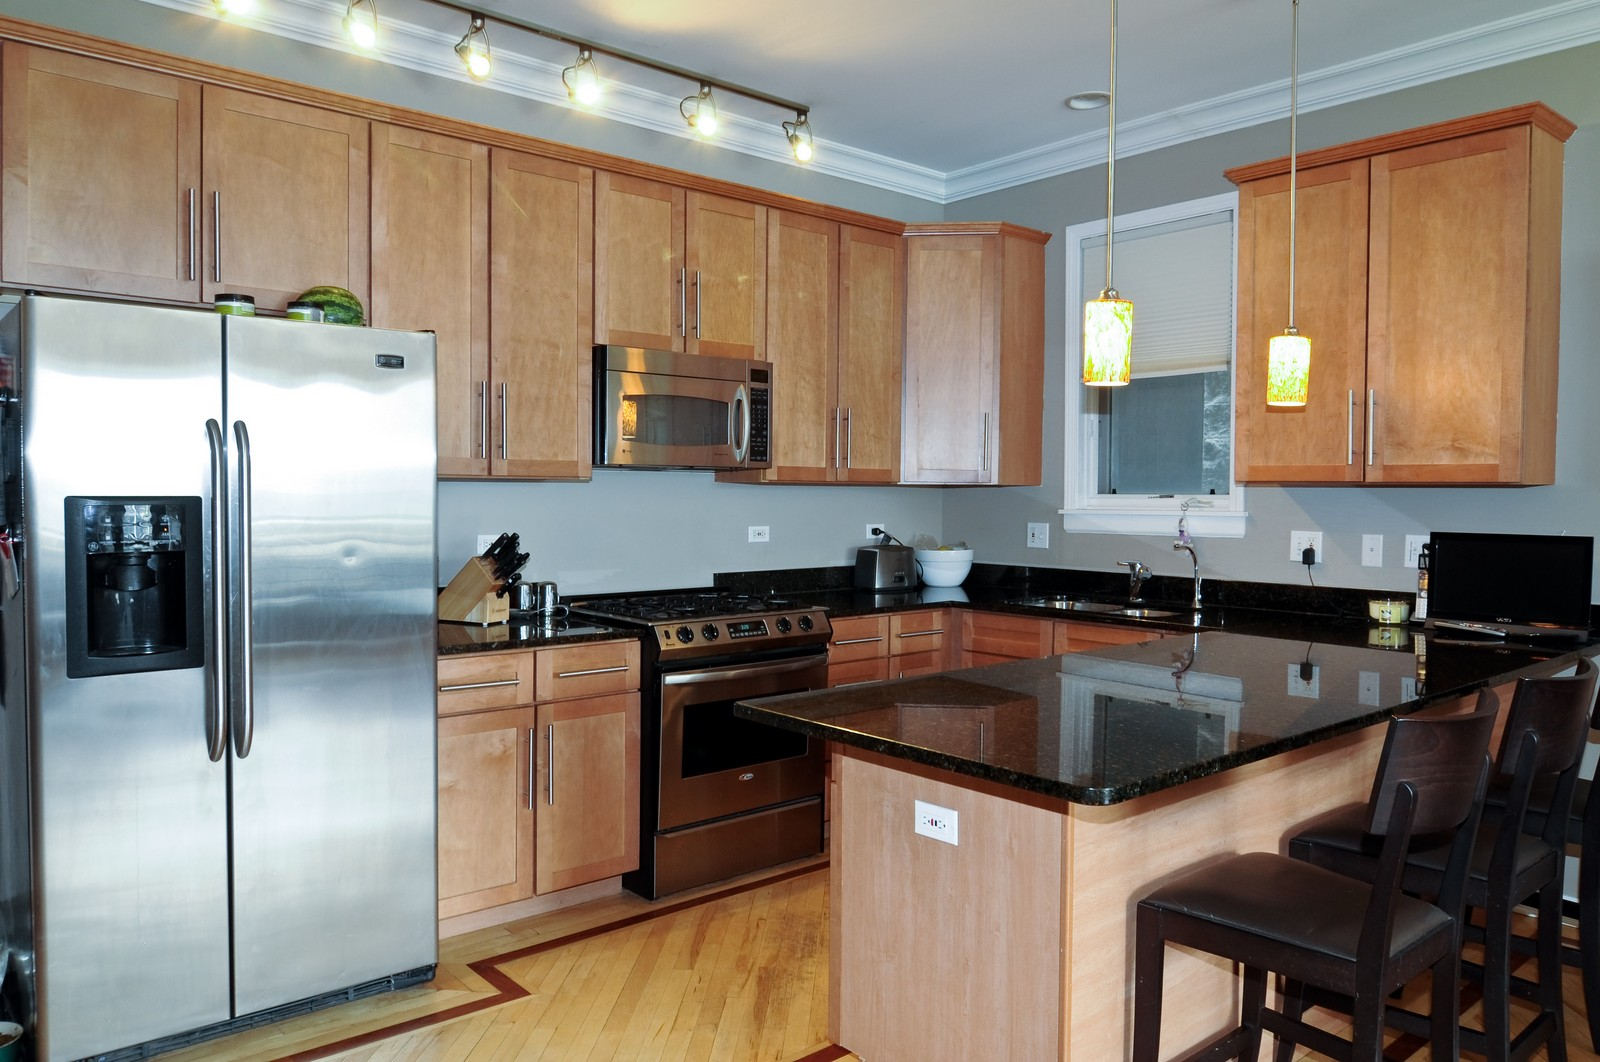 Real Estate Photography - 1414 W. Chestnut, 1, Chicago, IL, 60622 - Kitchen